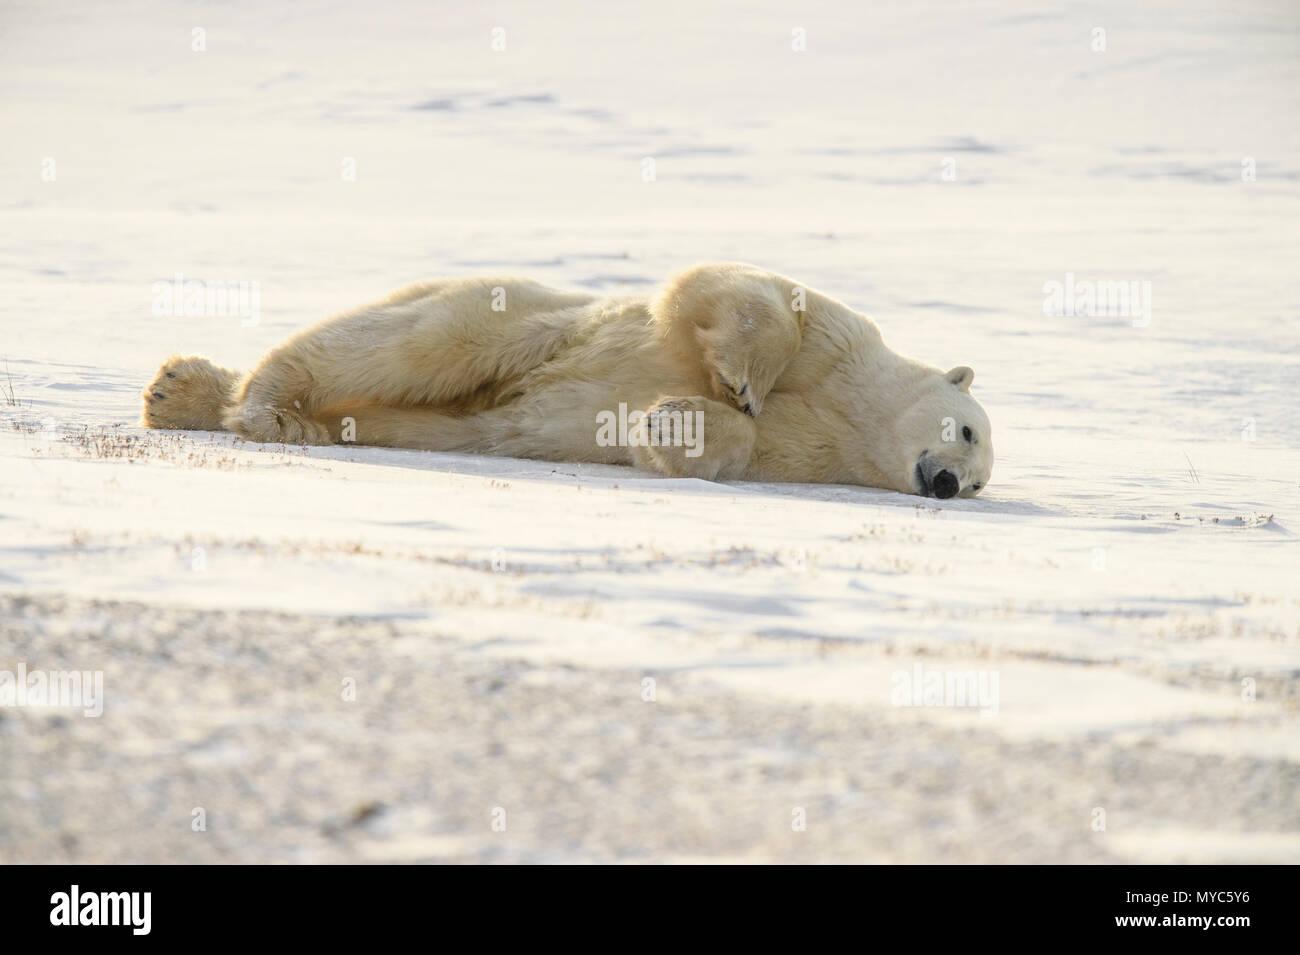 Polar Bear (Ursus maritimus) Grooming behaviour, Wapusk NP, Cape Churchill, Manitoba, Canada - Stock Image